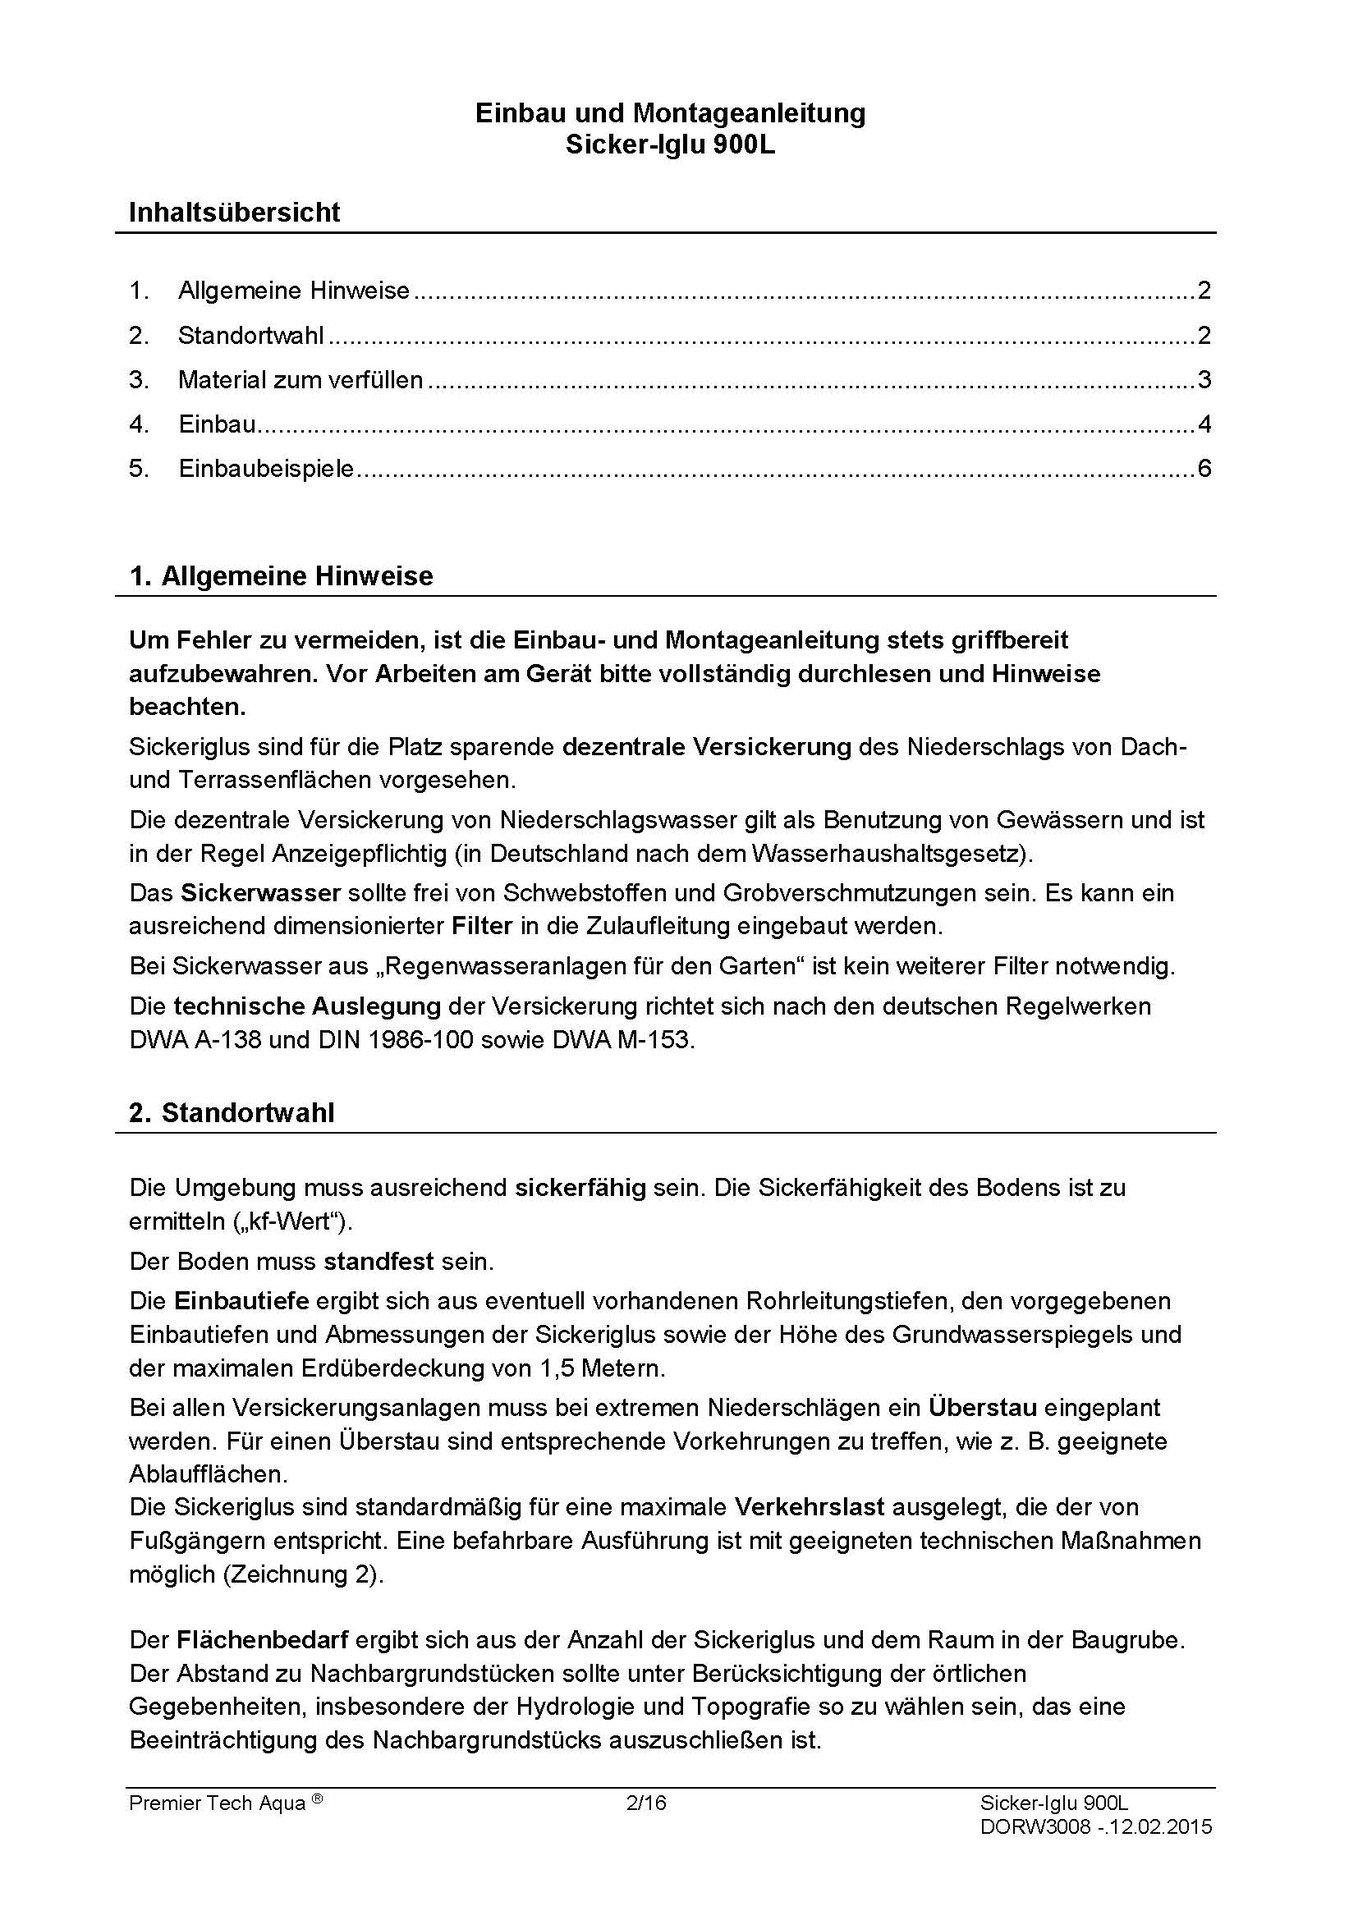 EA_Sickeriglu-DORW2175_080313_Seite_02